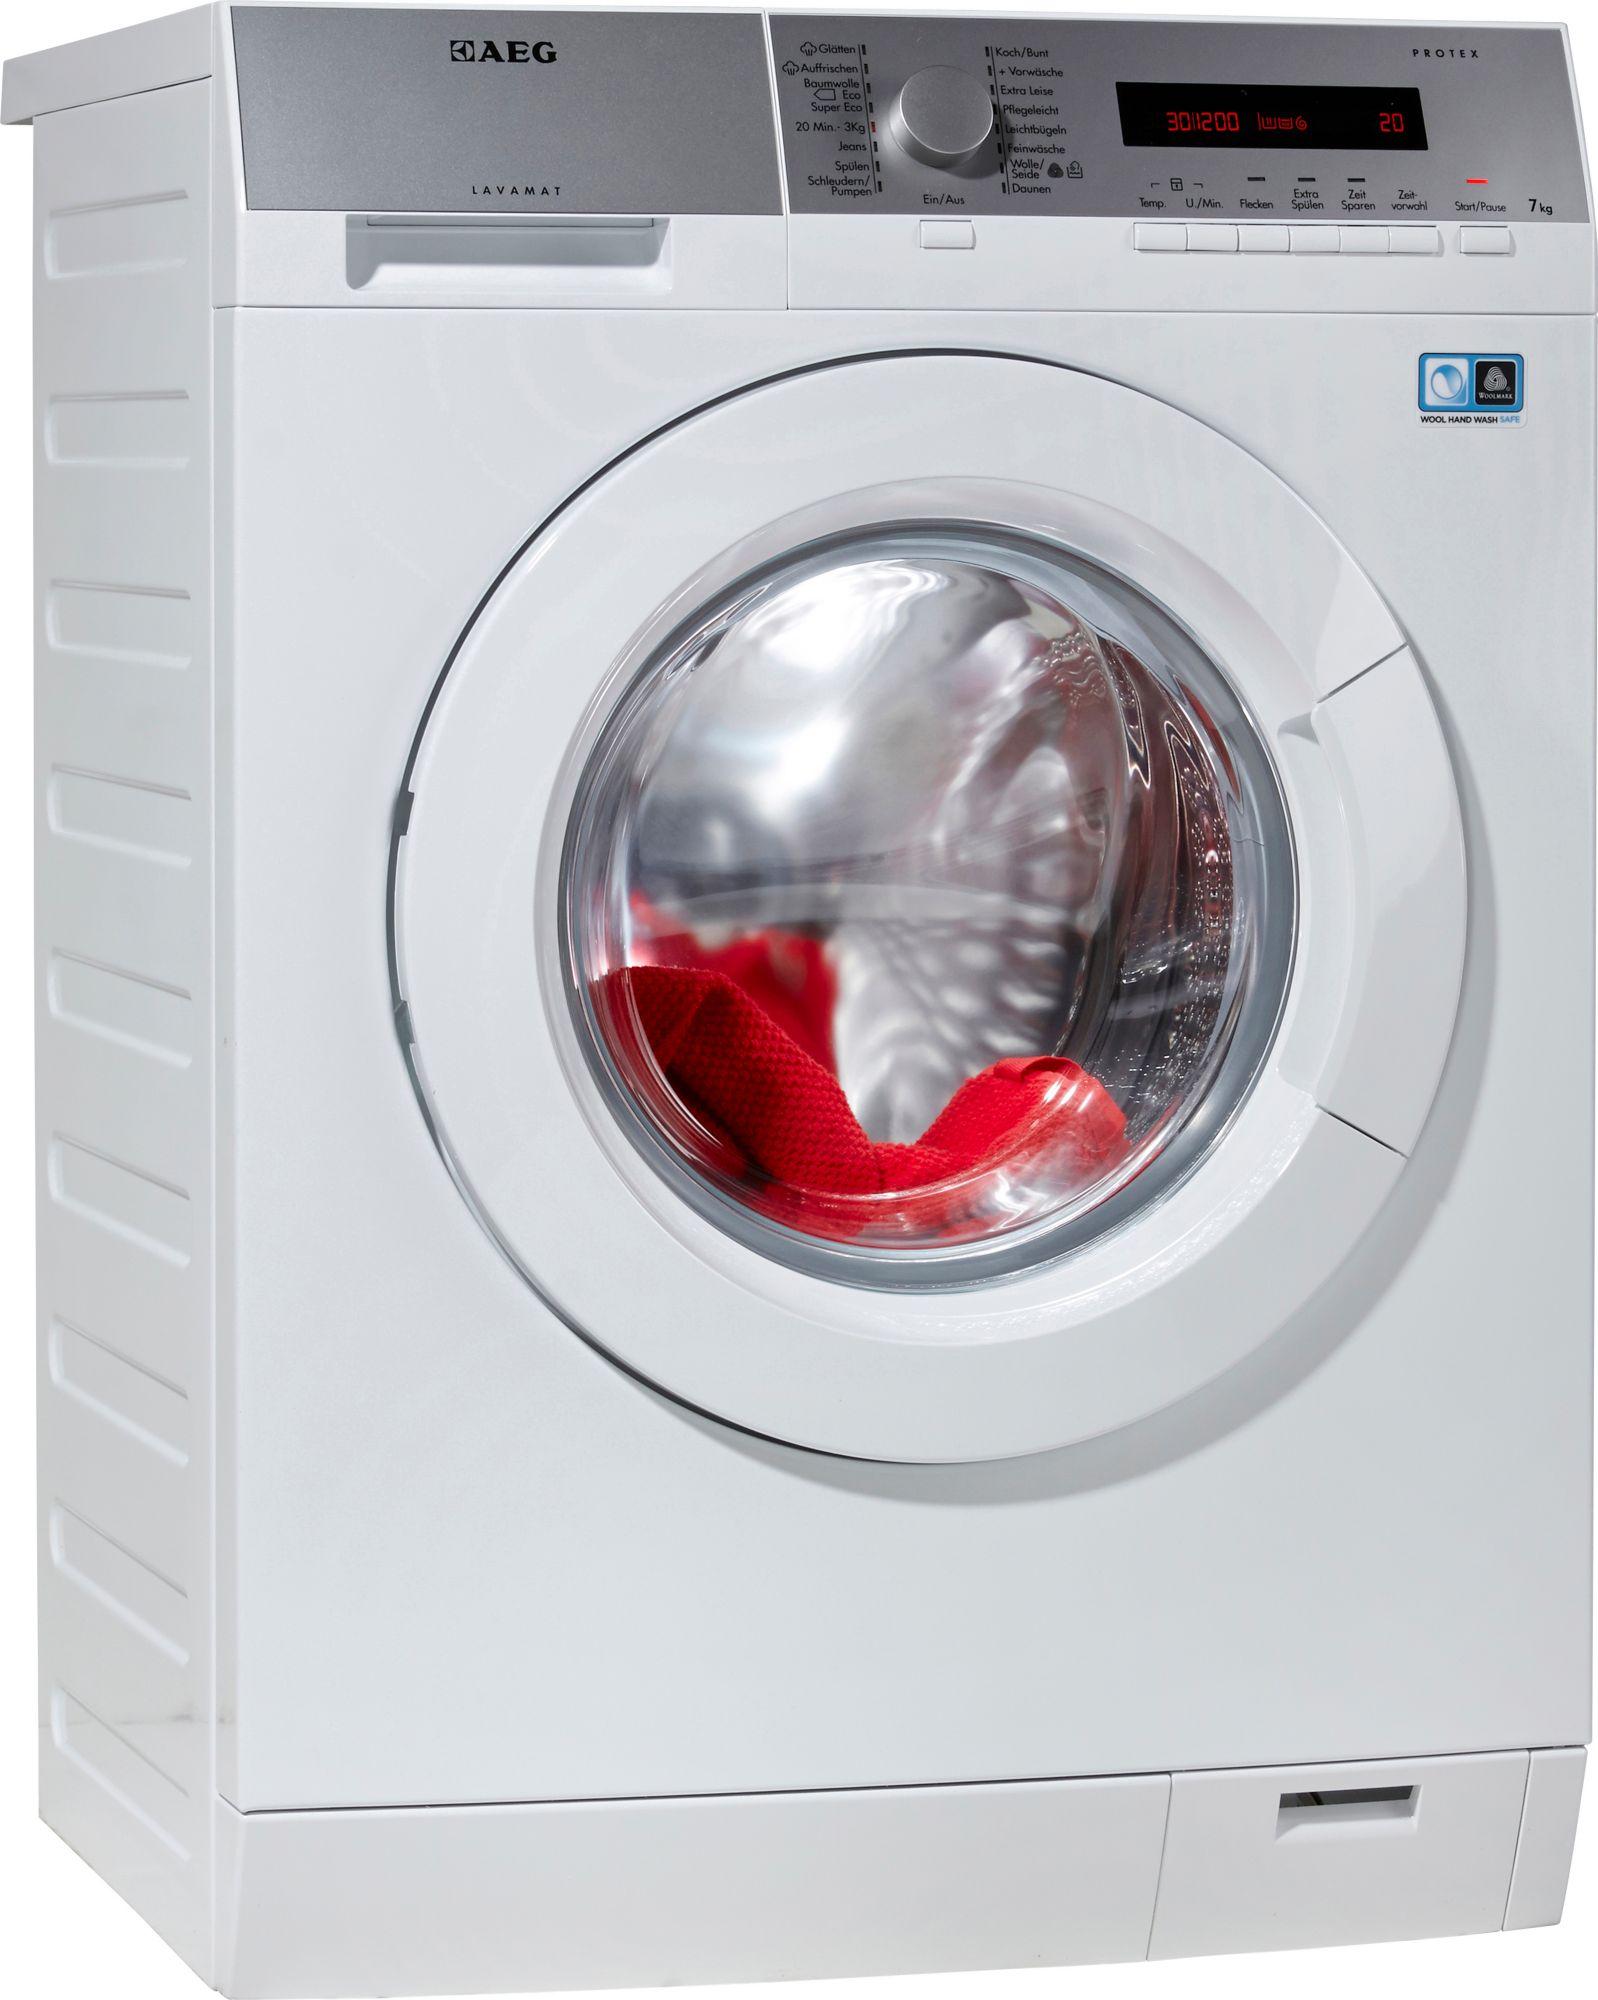 aeg waschmaschine lavamat a 7 kg 1400 u min. Black Bedroom Furniture Sets. Home Design Ideas